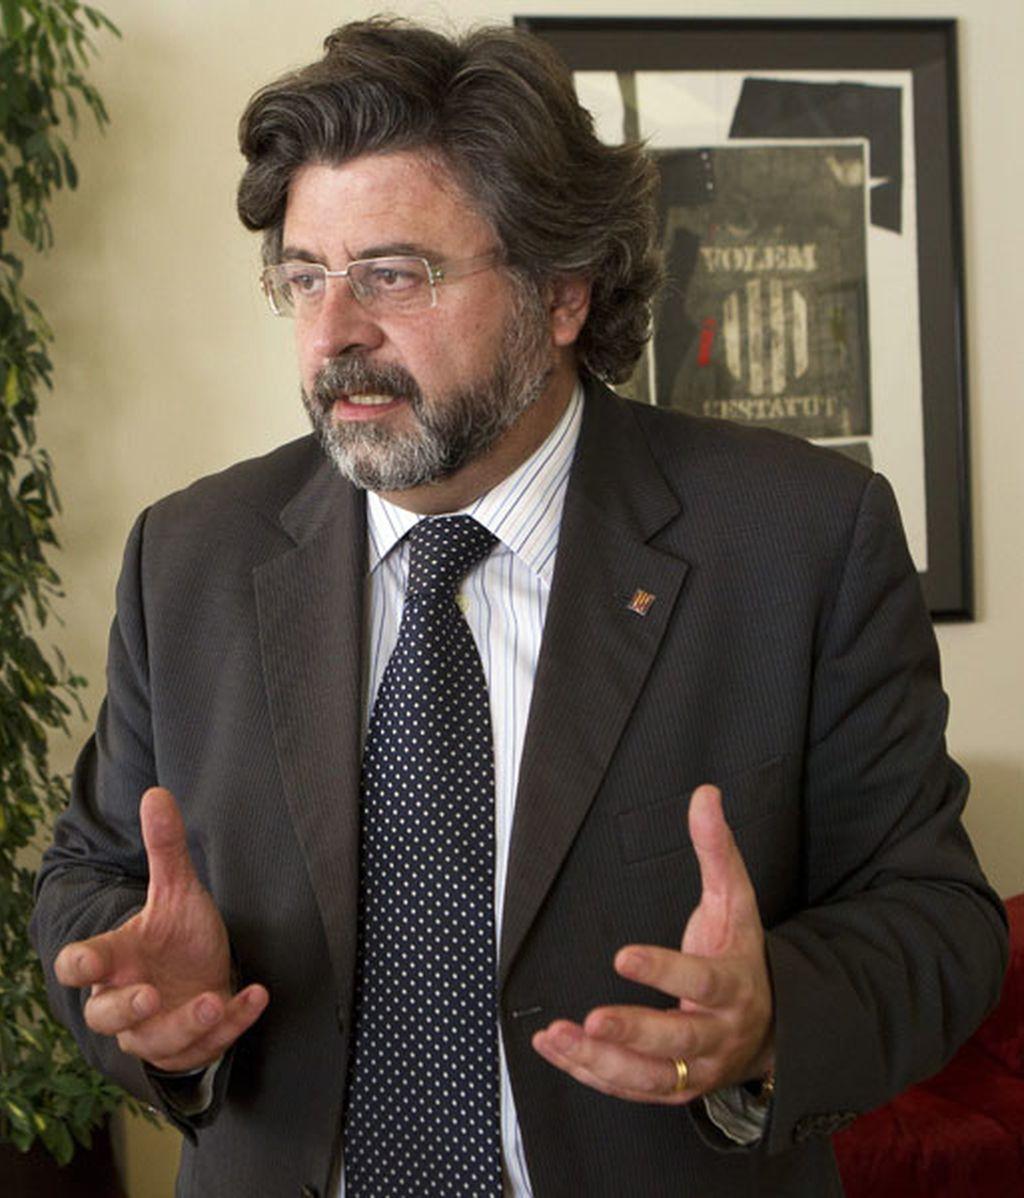 Cataluña no acude a la reunión sobre universidades